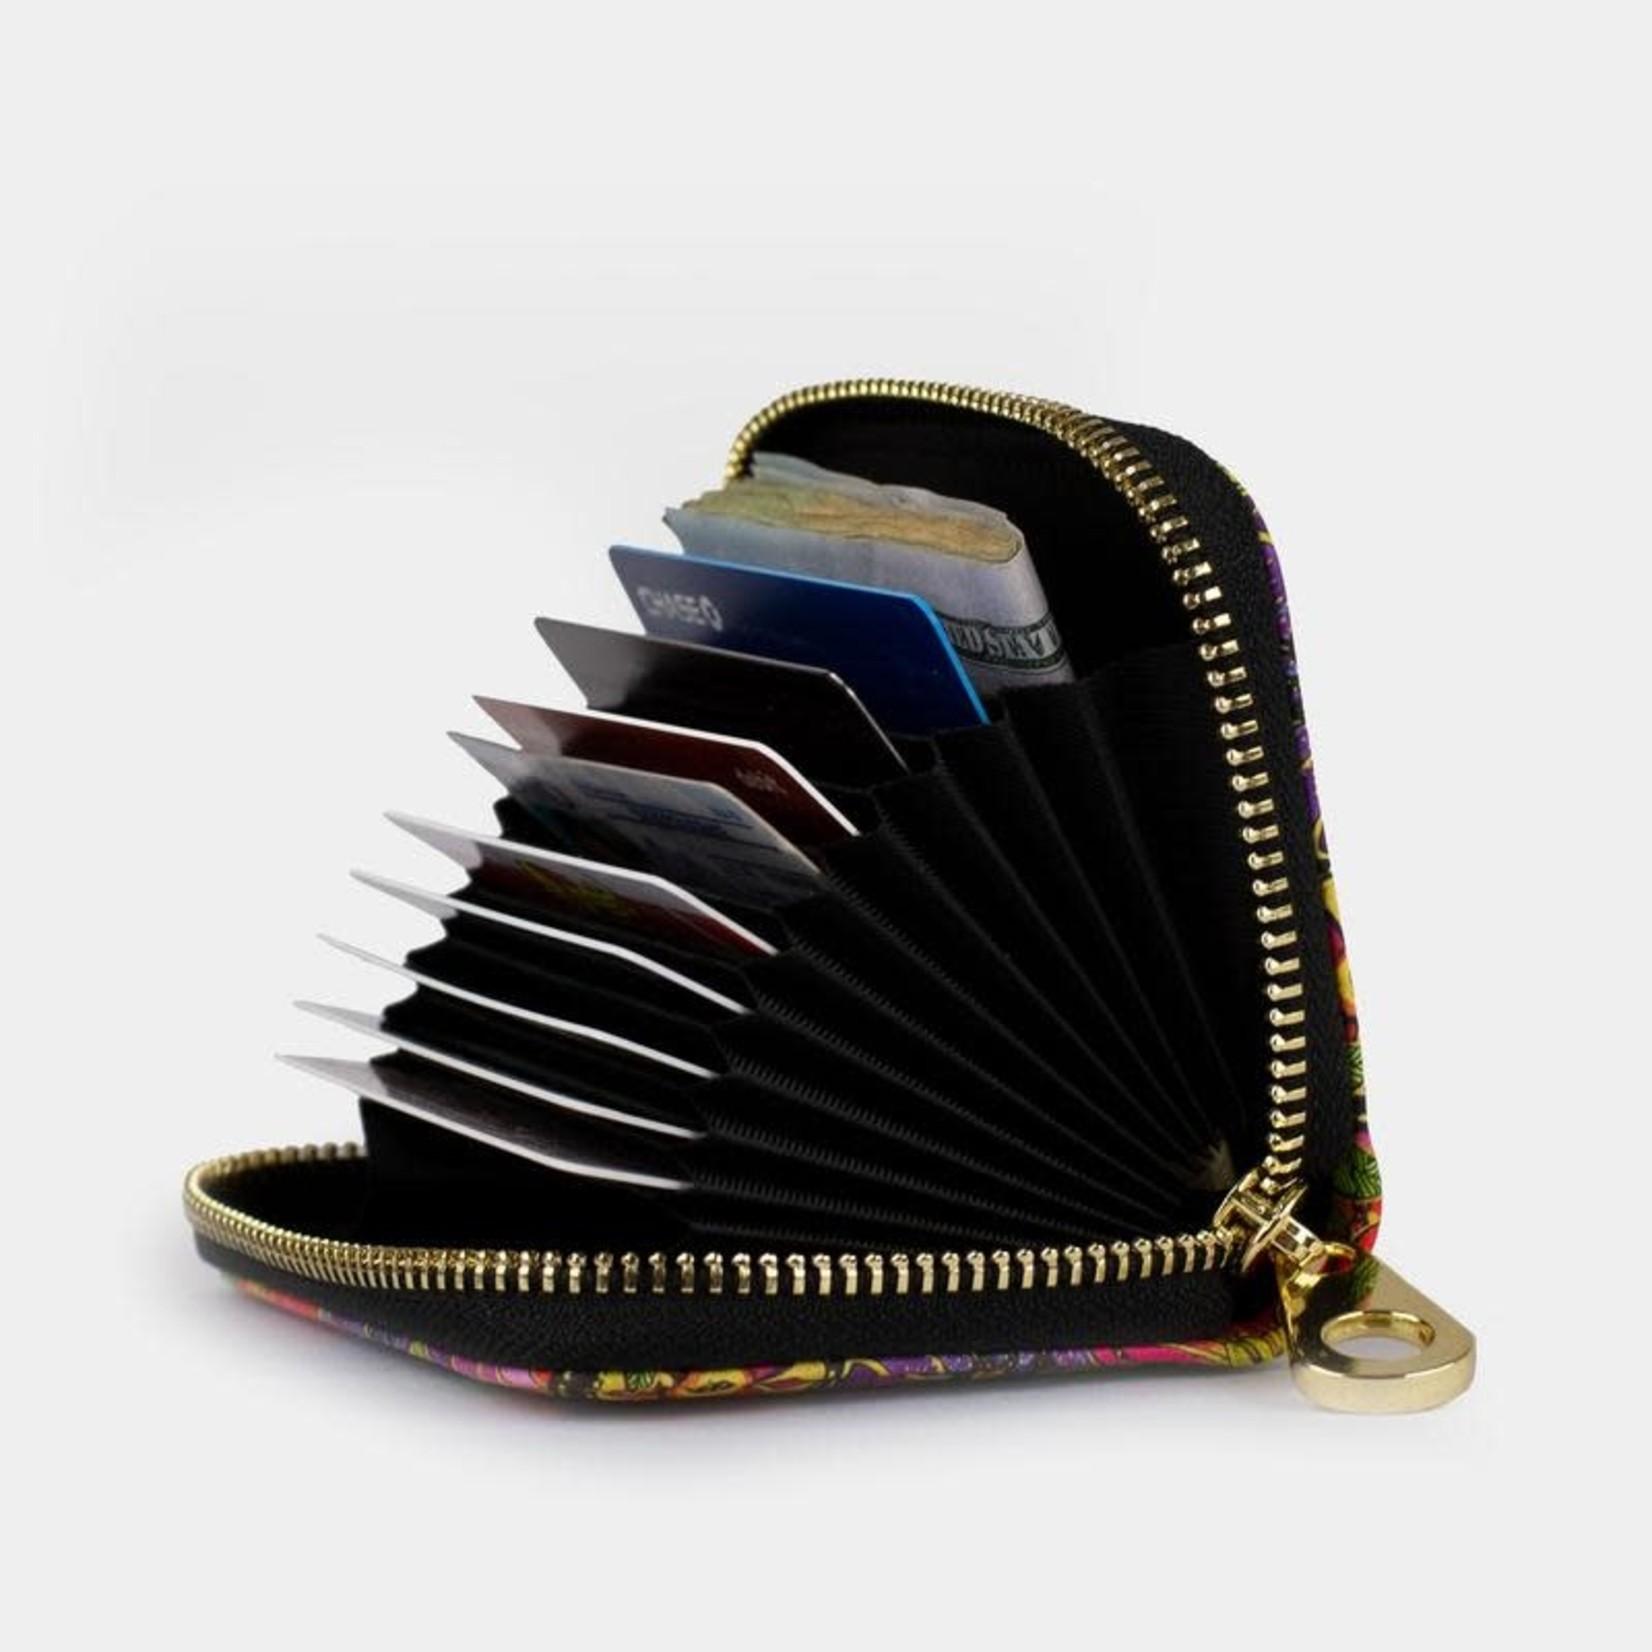 Monarque Zippered Wallet - Burch - Fantasticats